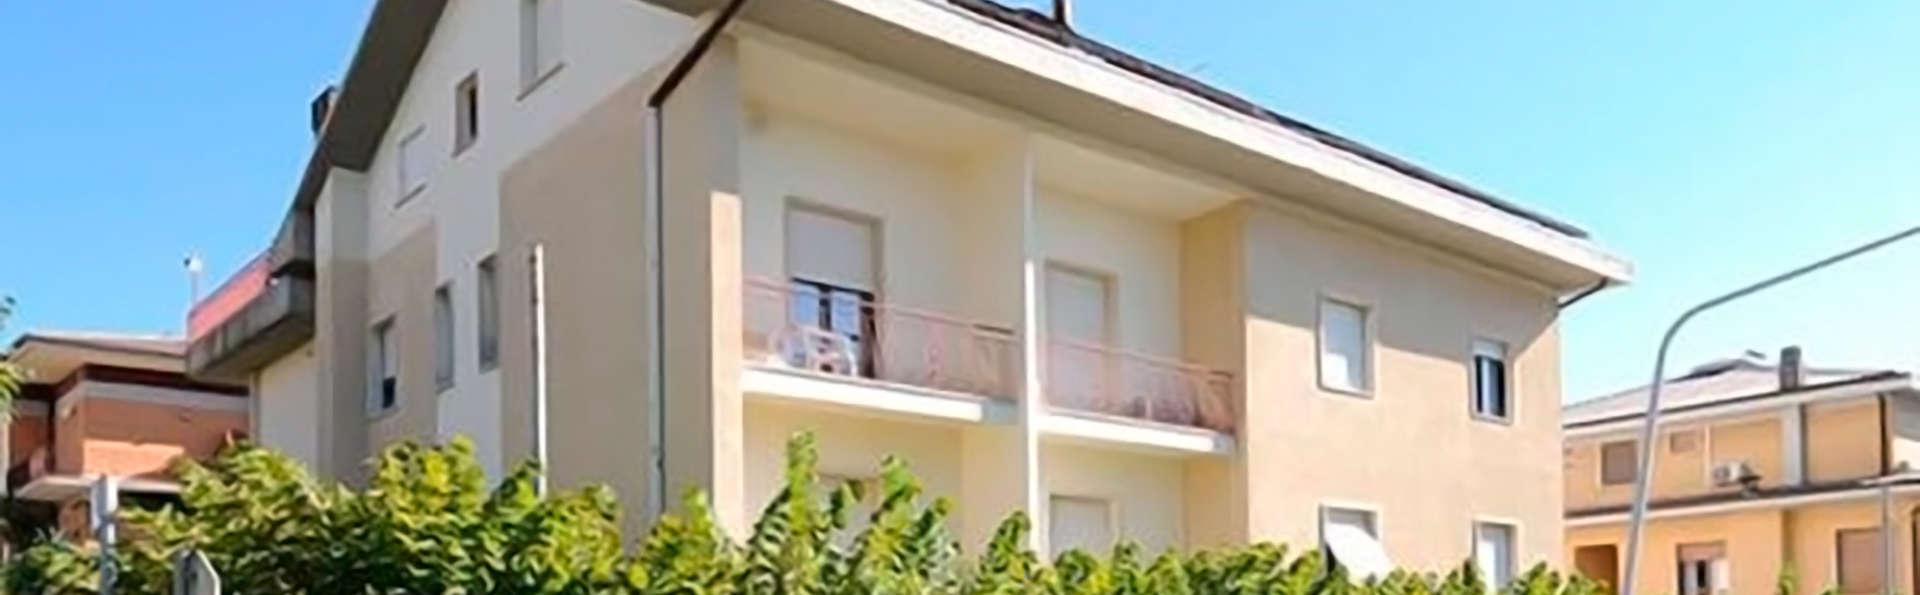 Hotel Perugina - Edit_Front.jpg